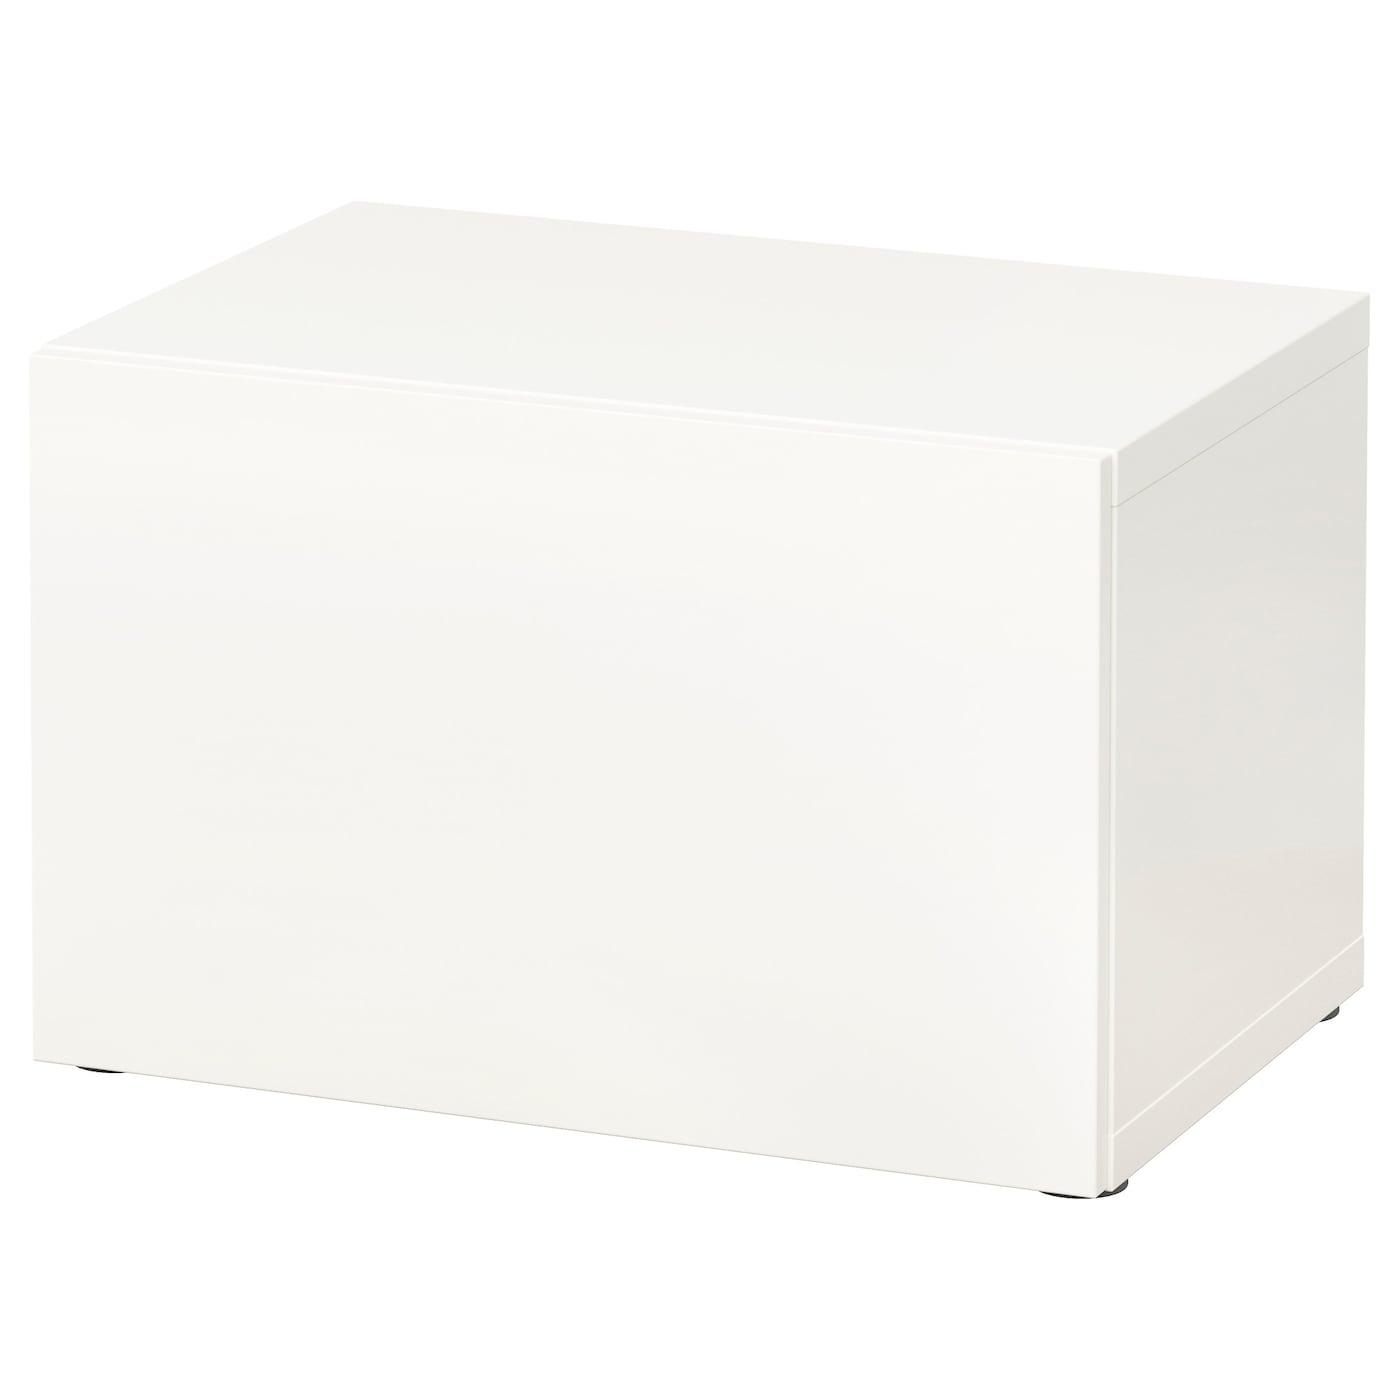 BESTÅ Shelf unit with door - Lappviken white - IKEA